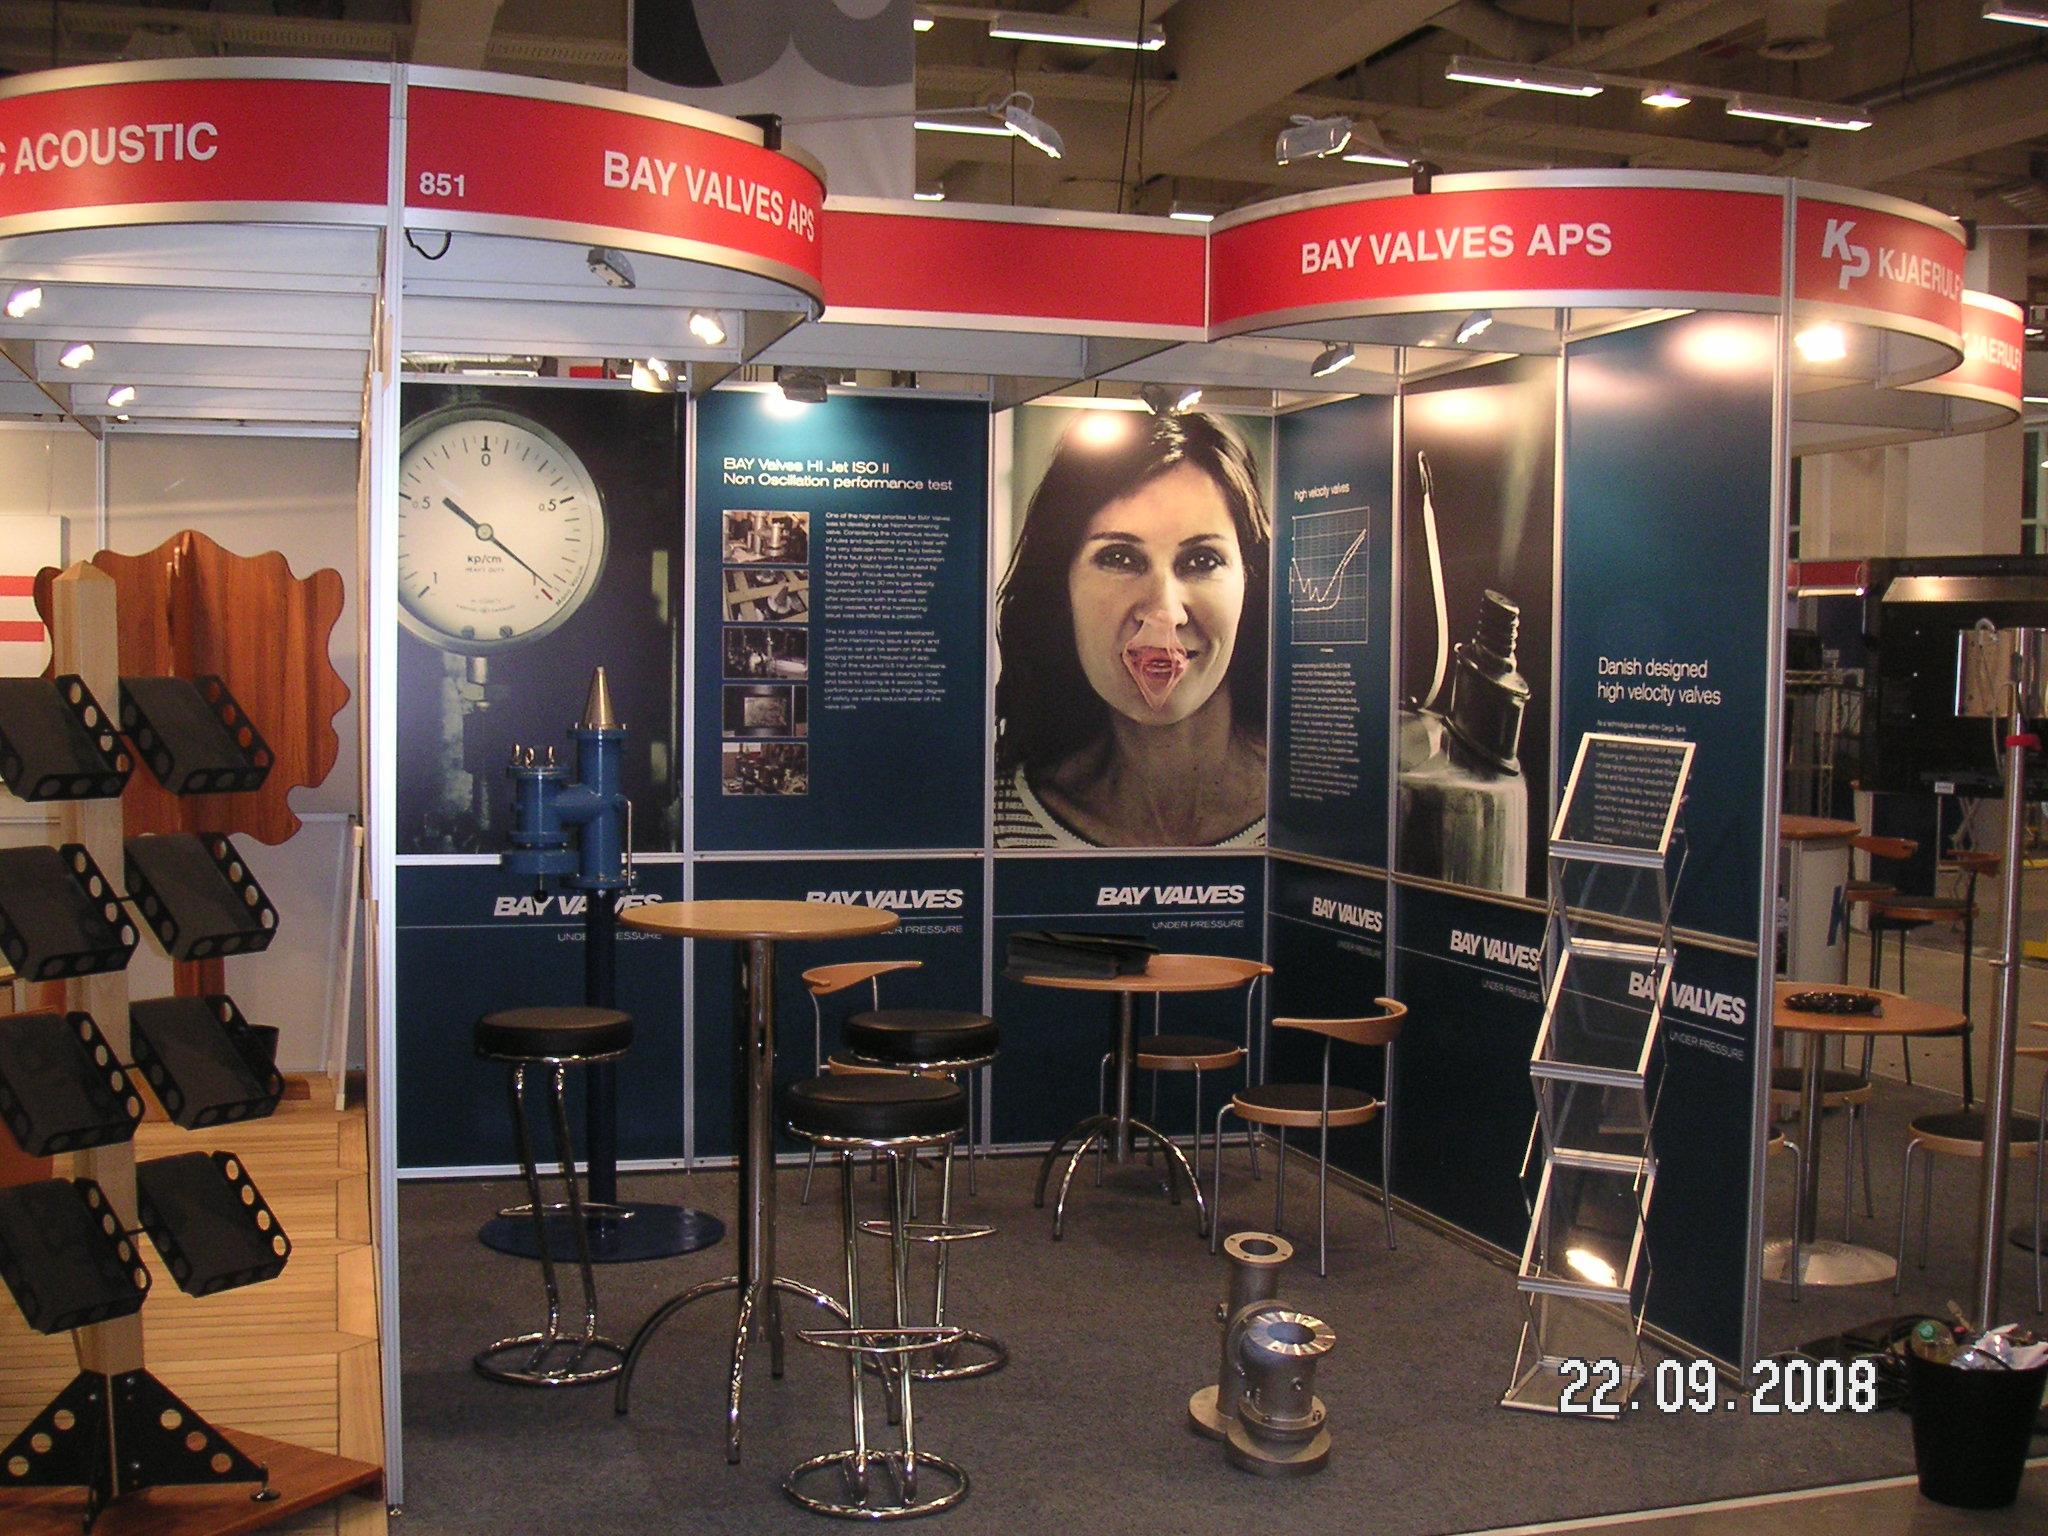 Exhibitions 09 2008 011 high velocity valves BAY VALVES – Home 09 2008 011